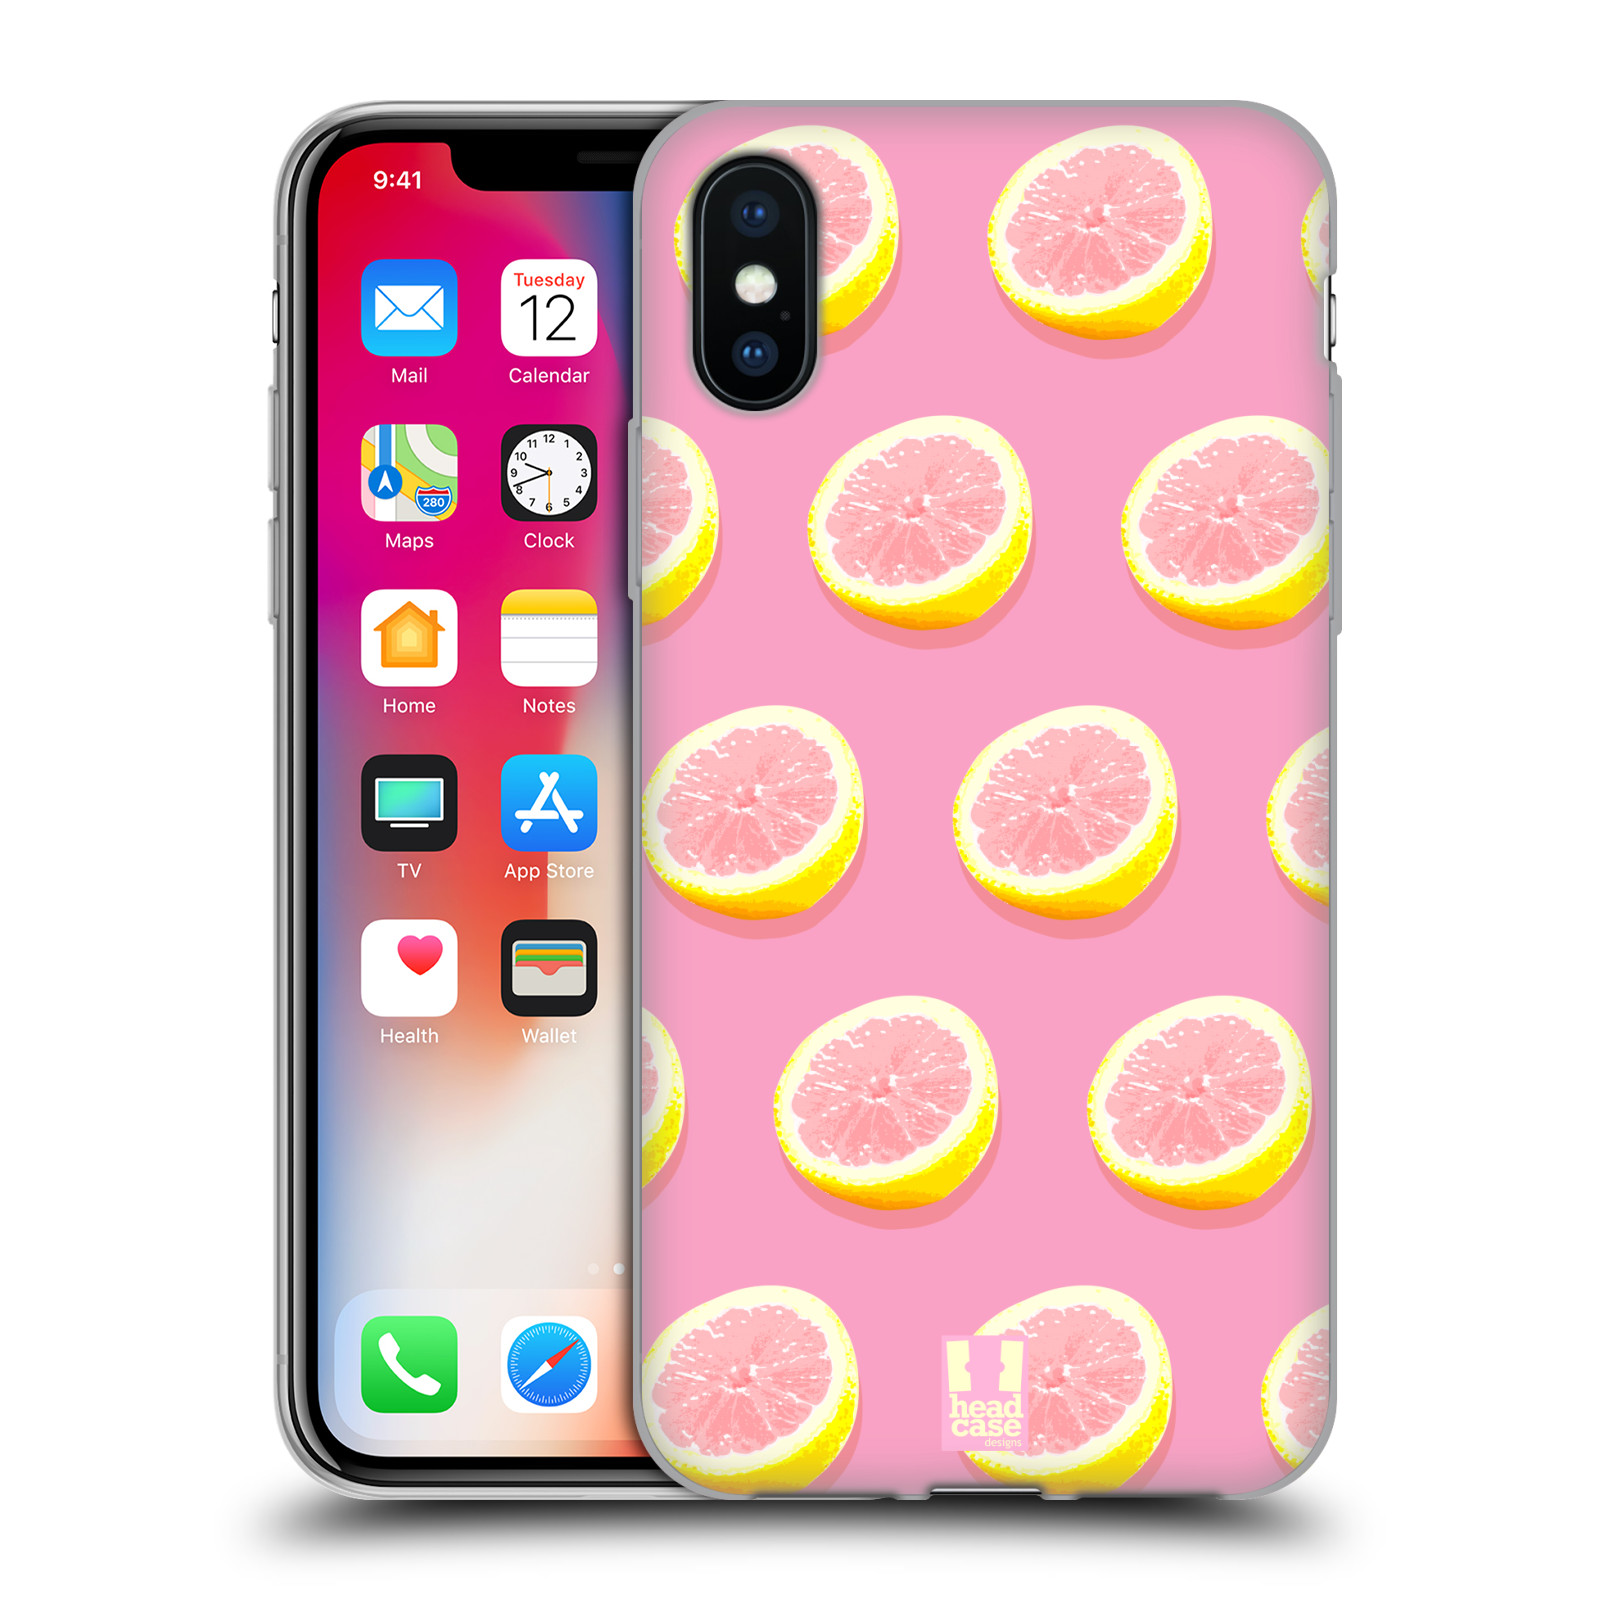 HEAD-CASE-DESIGNS-PINK-LEMONADE-SOFT-GEL-CASE-FOR-APPLE-iPHONE-PHONES